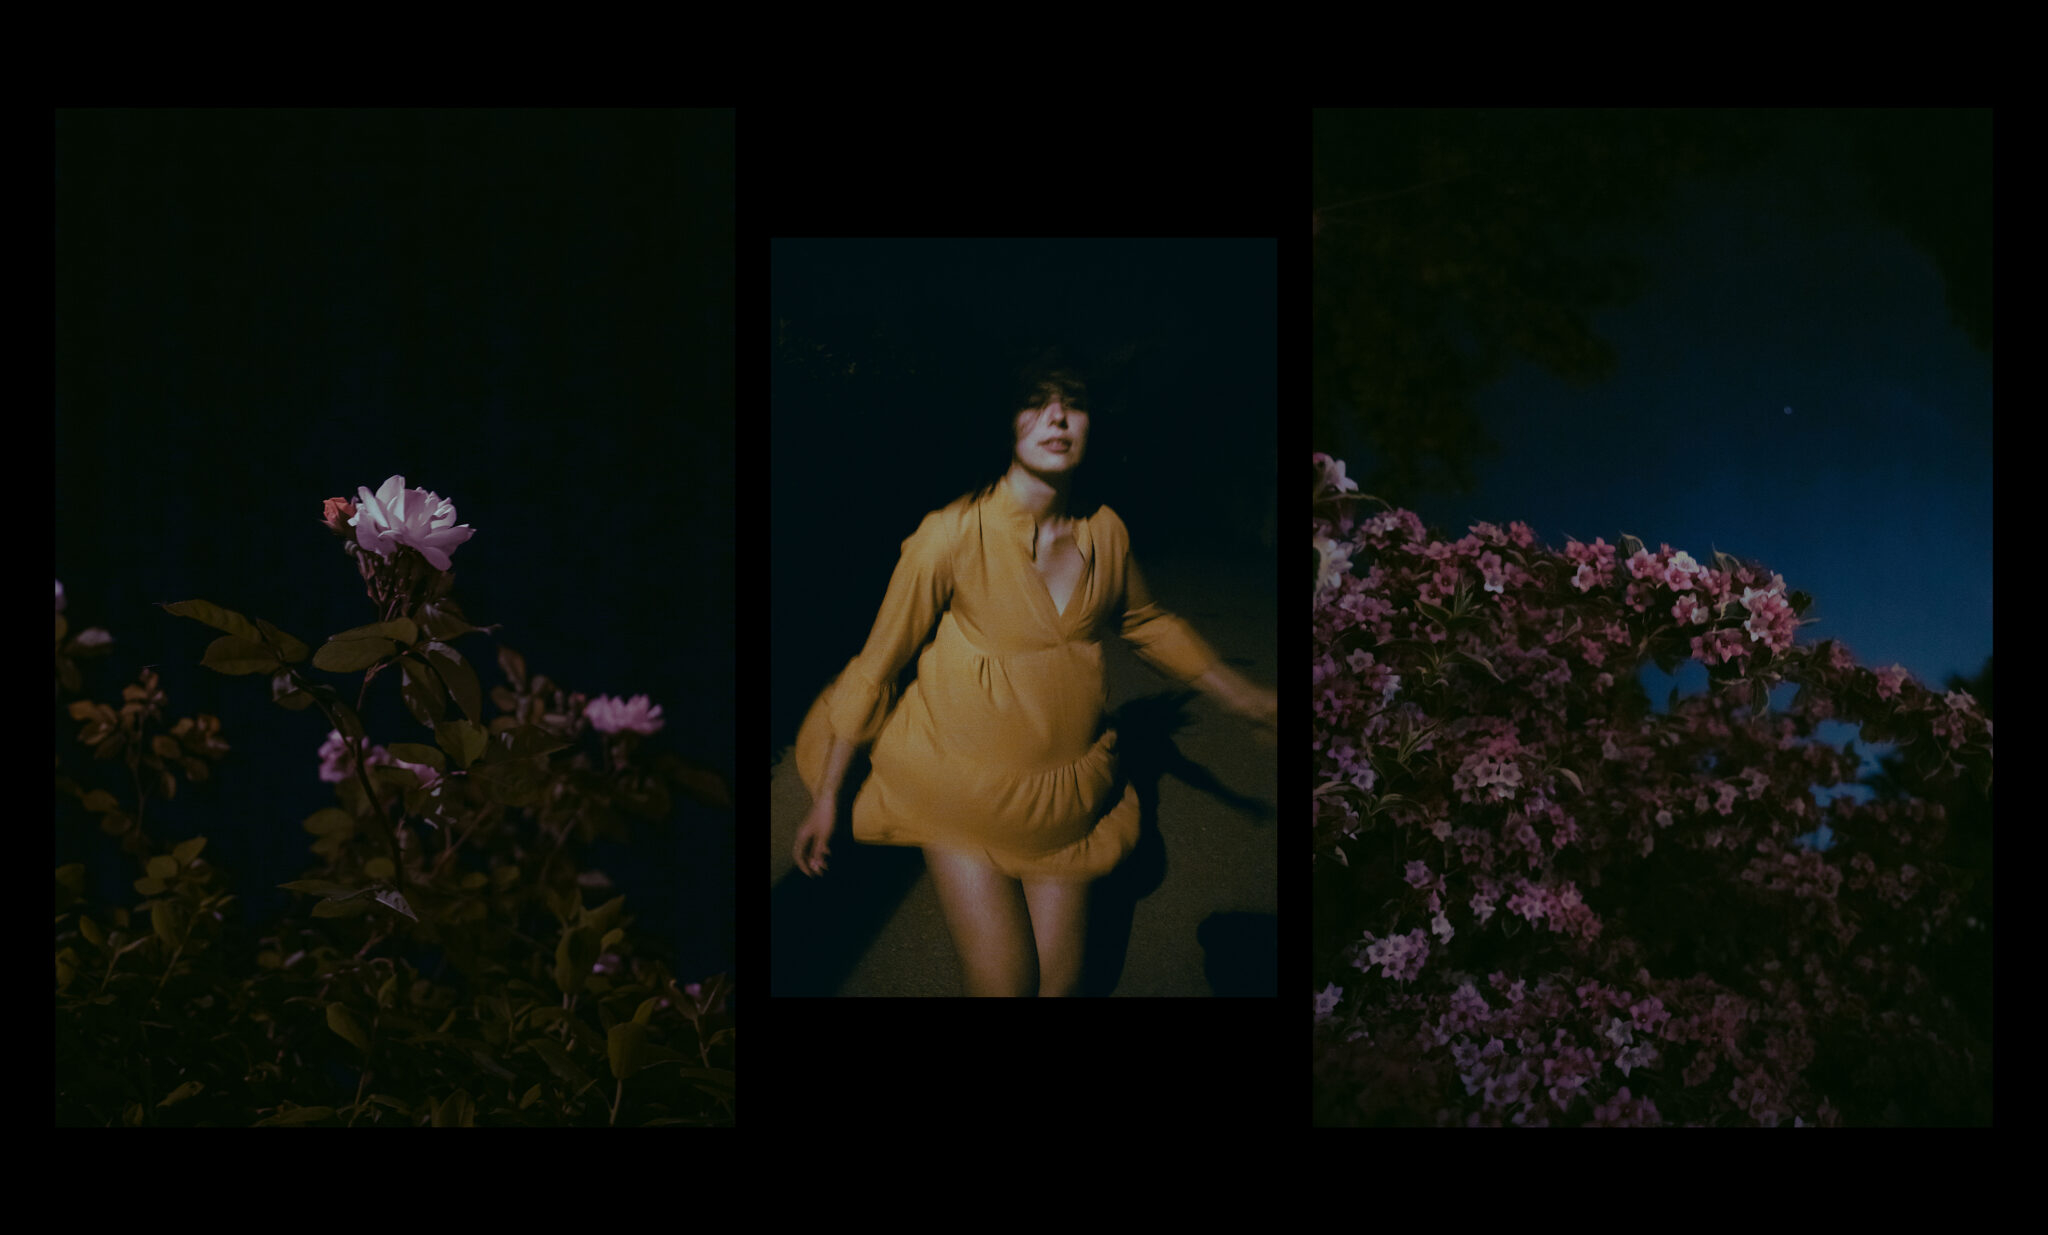 Still-not-afraid-of-the-dark_IreneVesentini-1-1